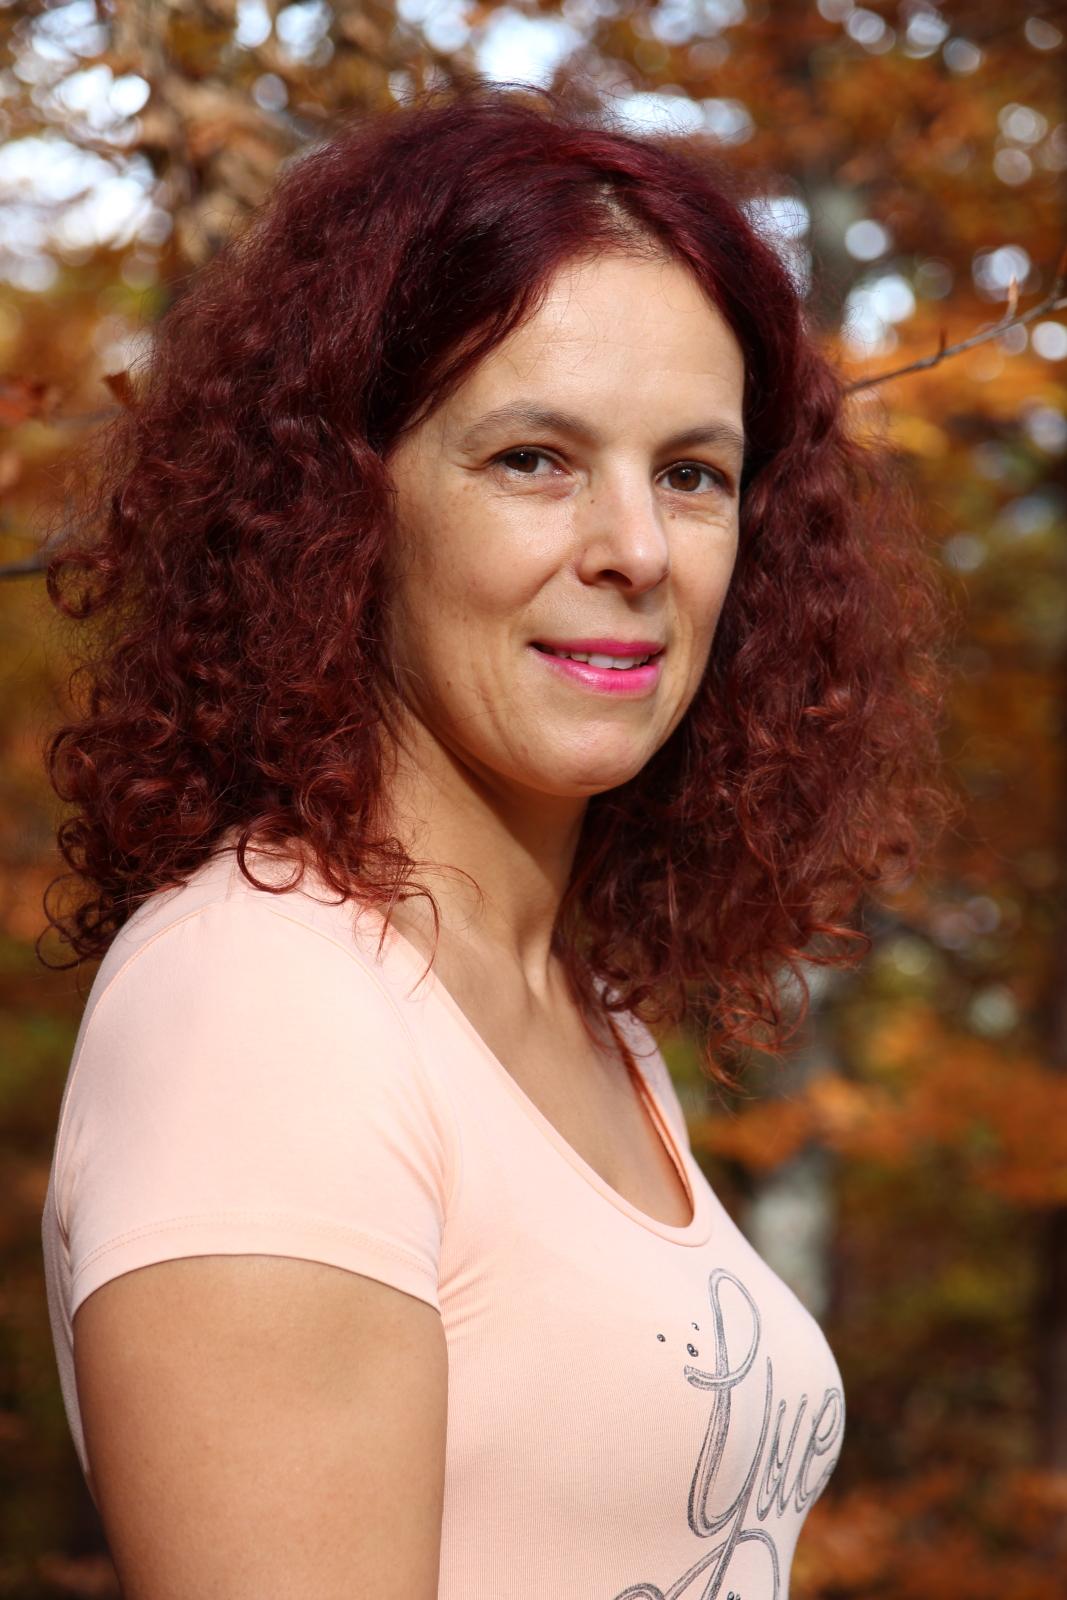 Meine Frau im Herbstwald.JPG